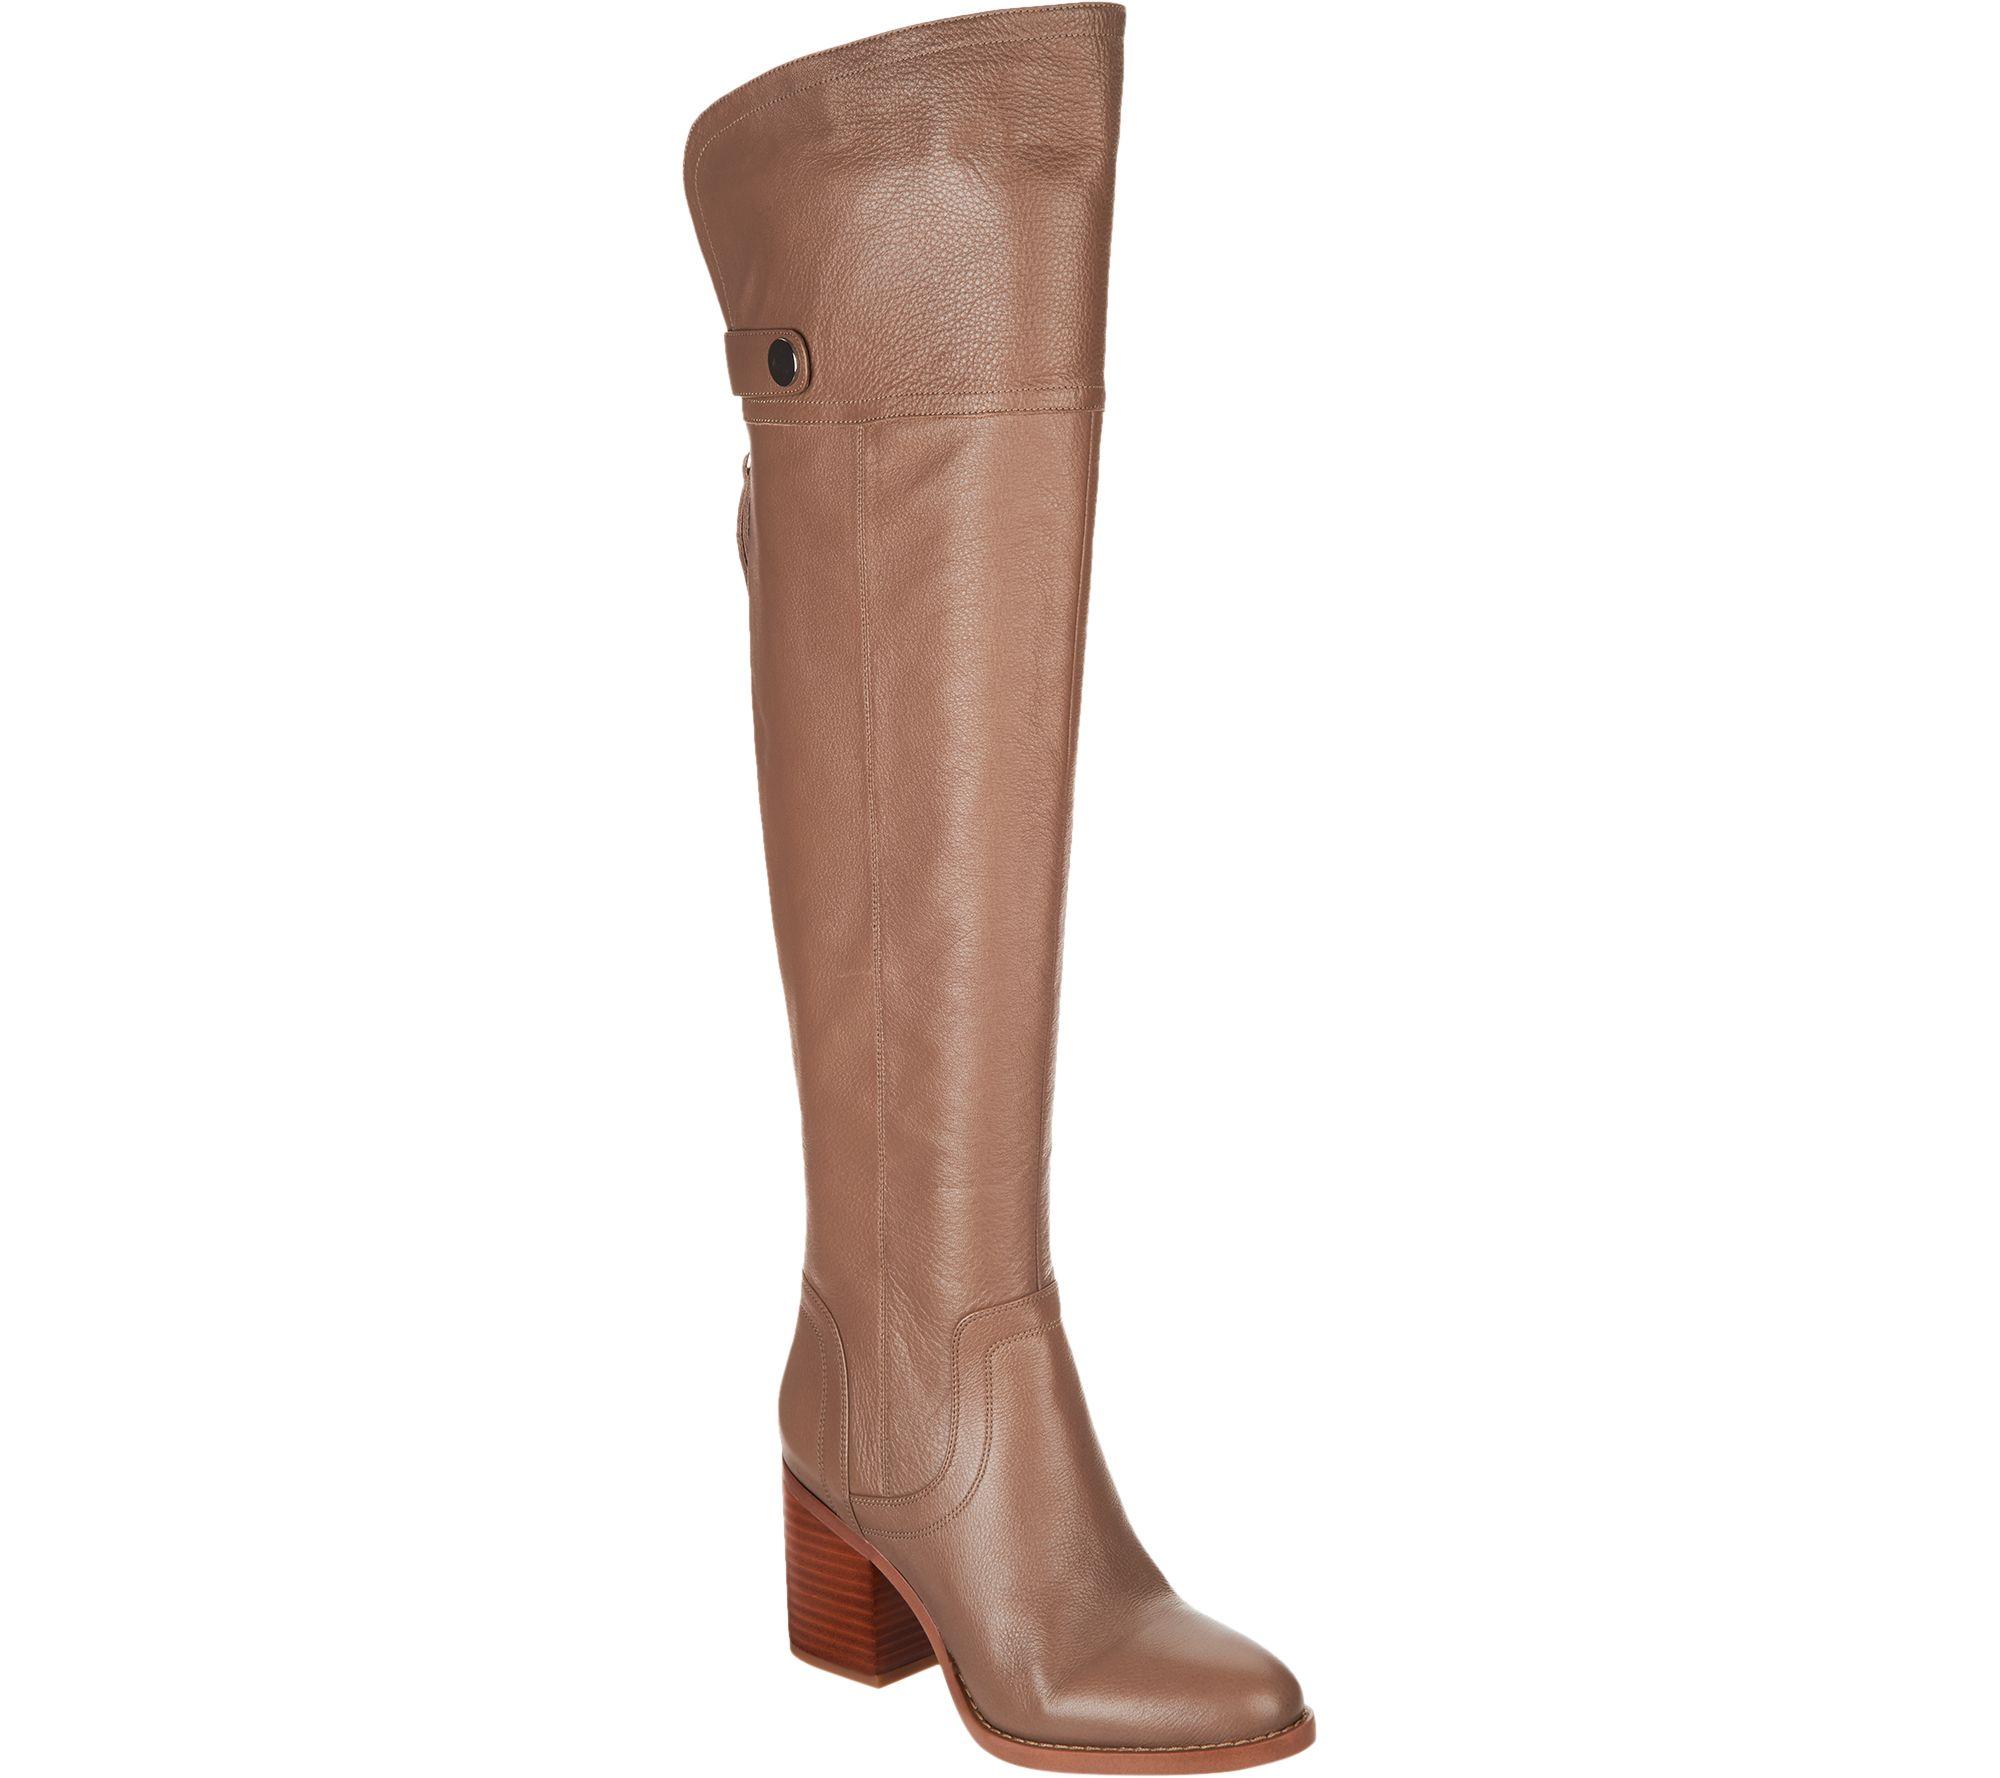 boot boutique — women's boots & fashion boots — qvc